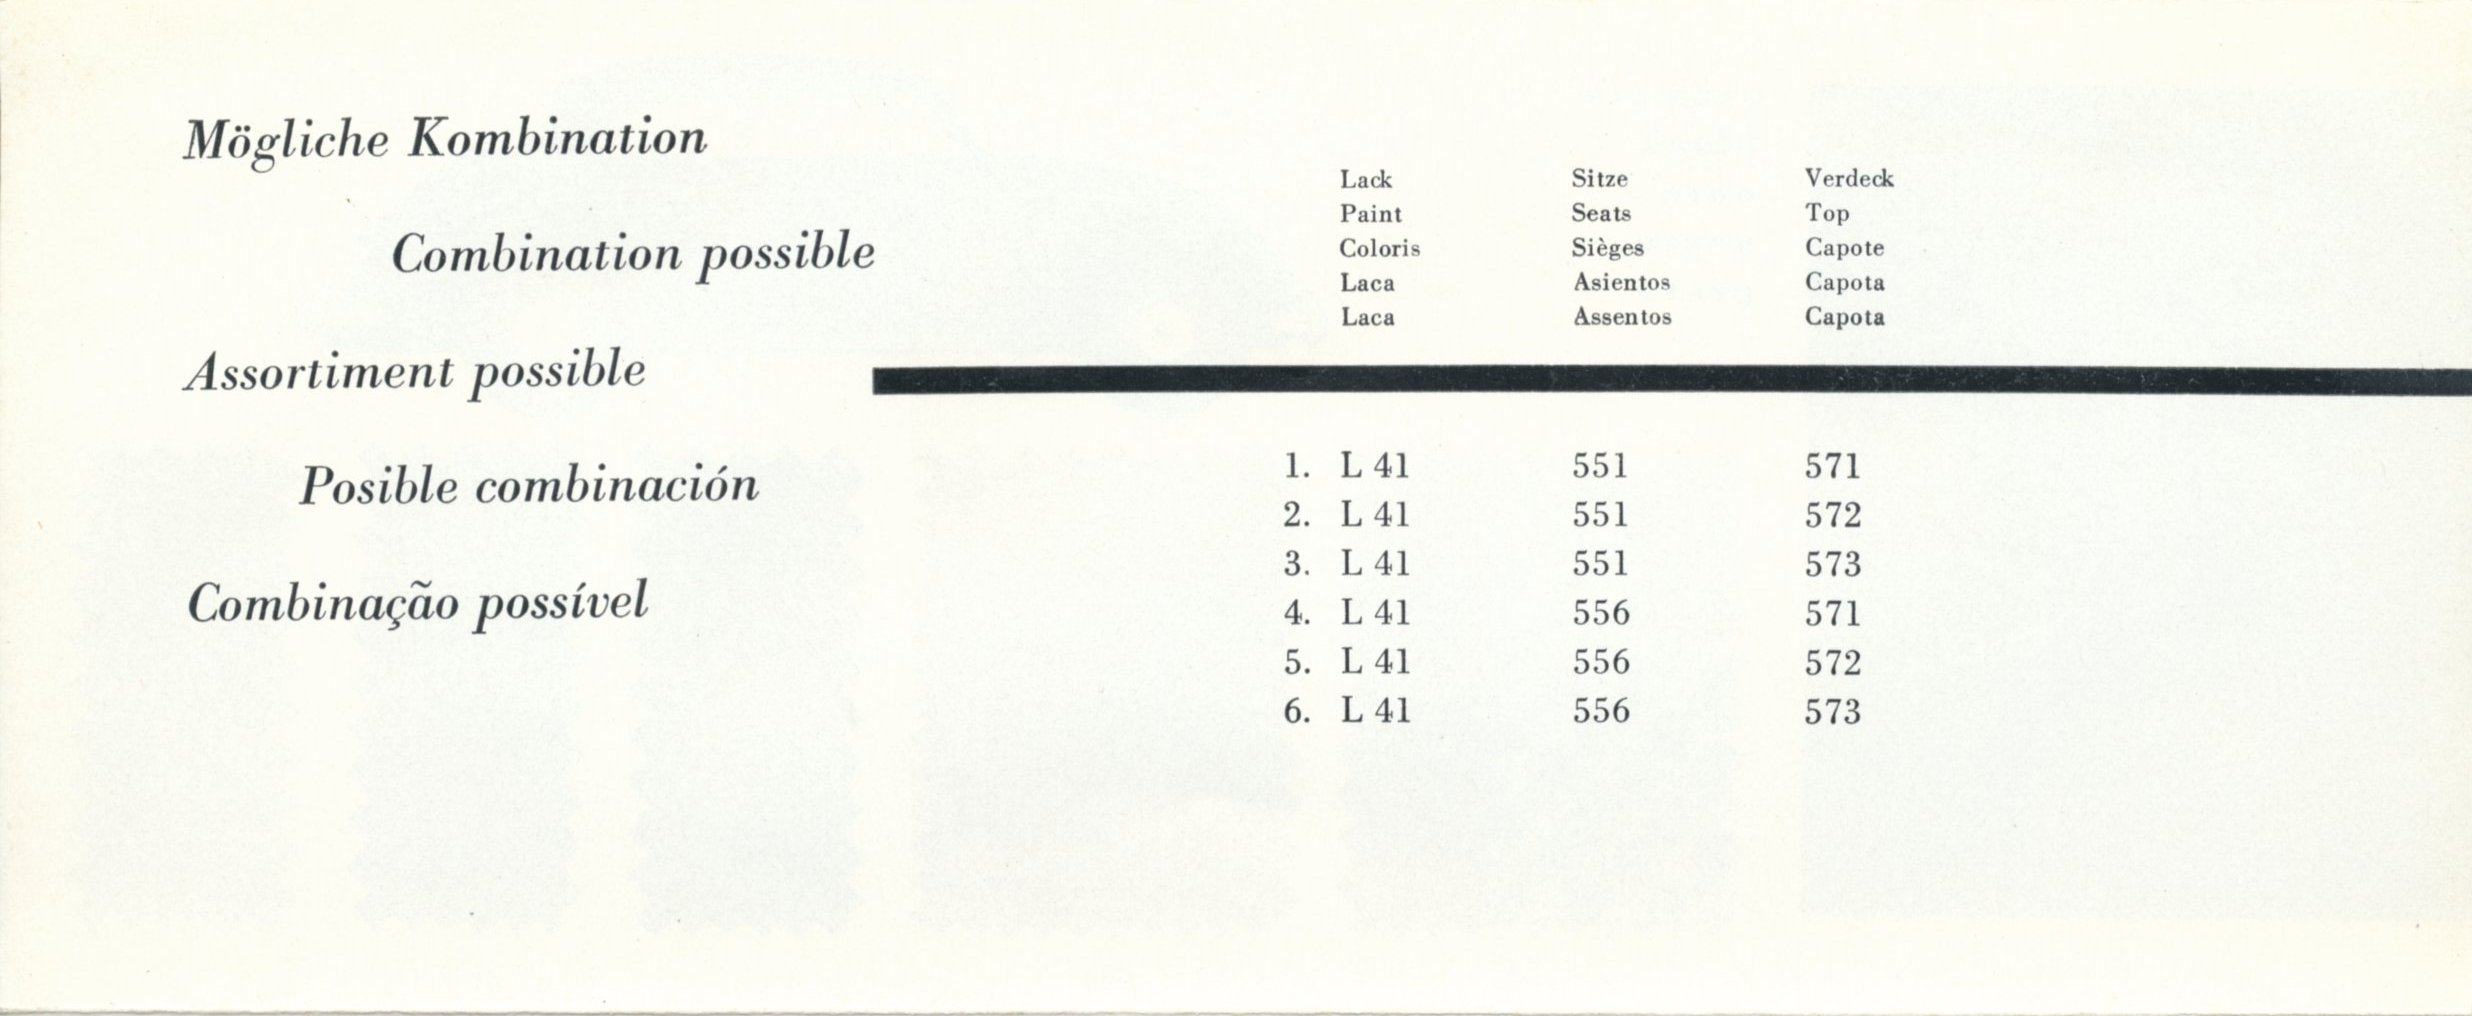 1956 Vw Beetle Wiring Diagram. Diagram. Auto Wiring Diagram